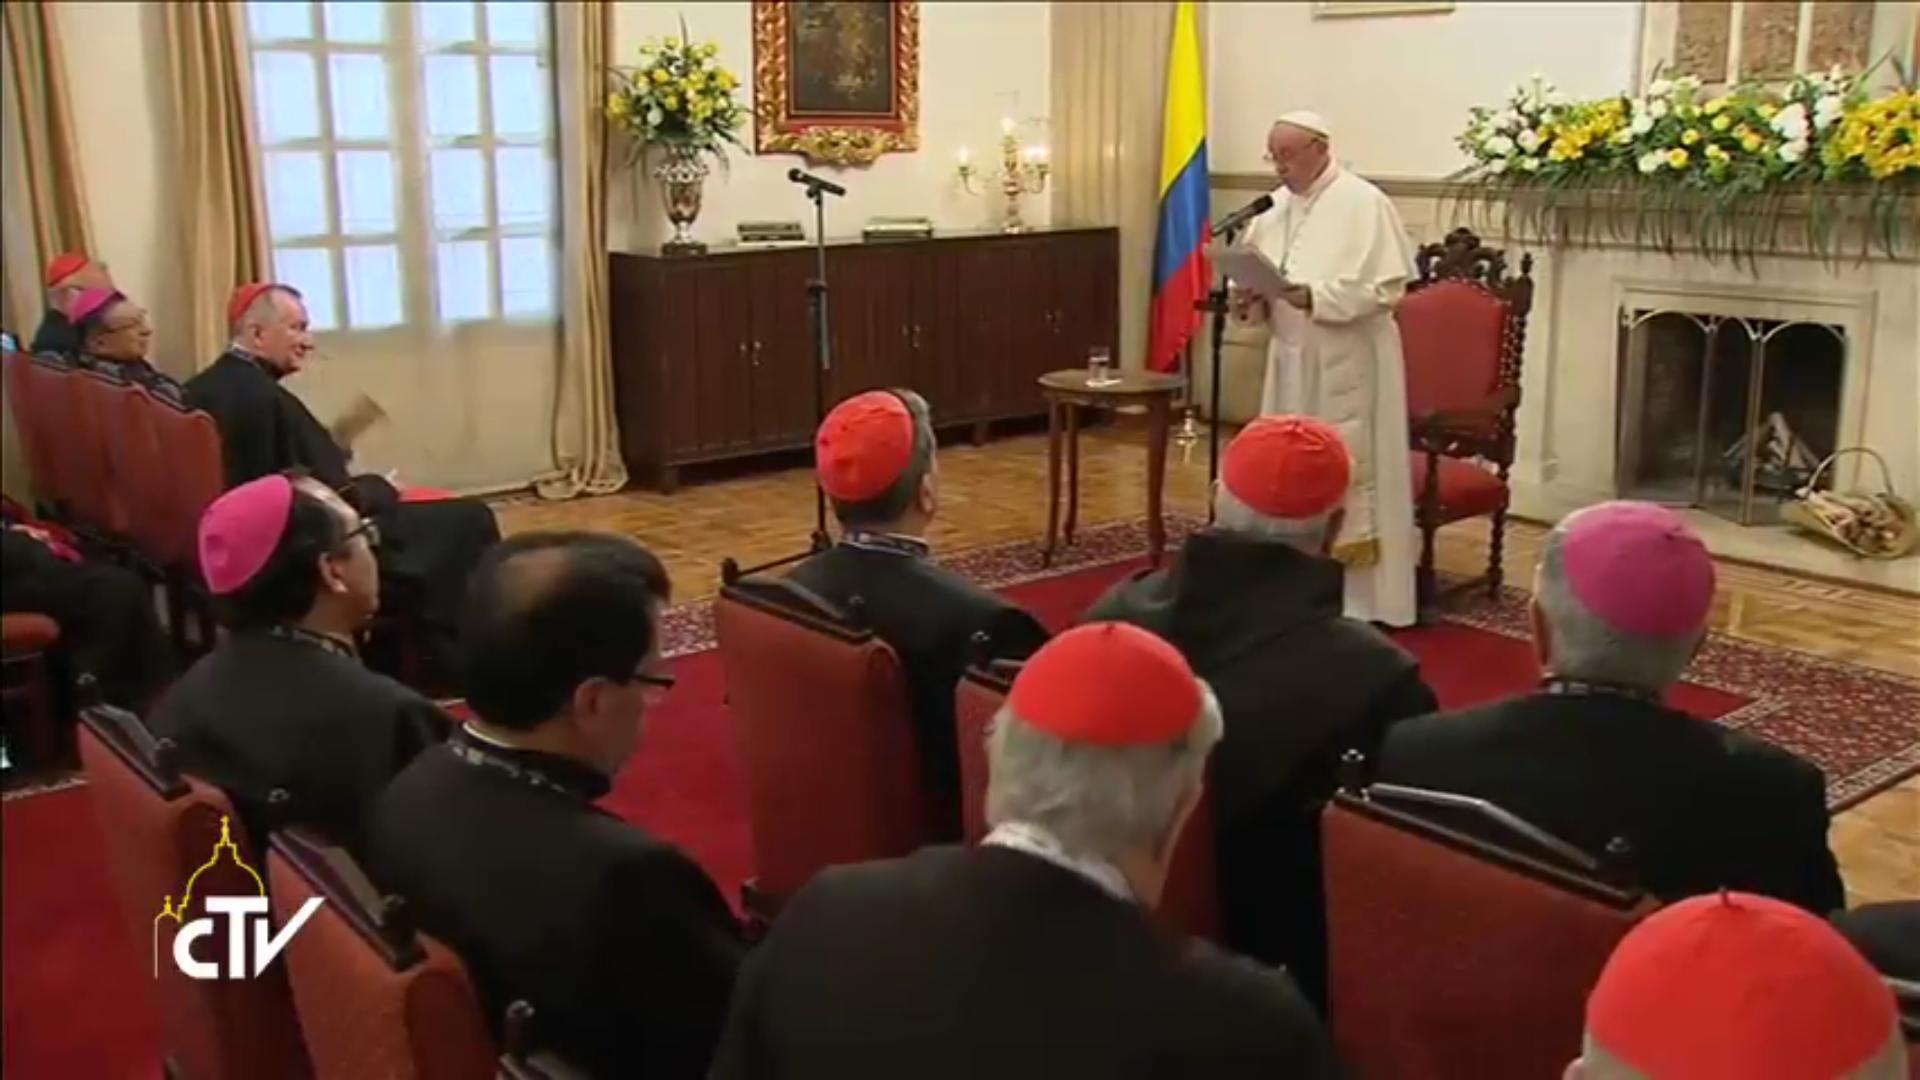 Pope Francis & CELAM, Bogota (Colombia), 07/09/2017, CTV